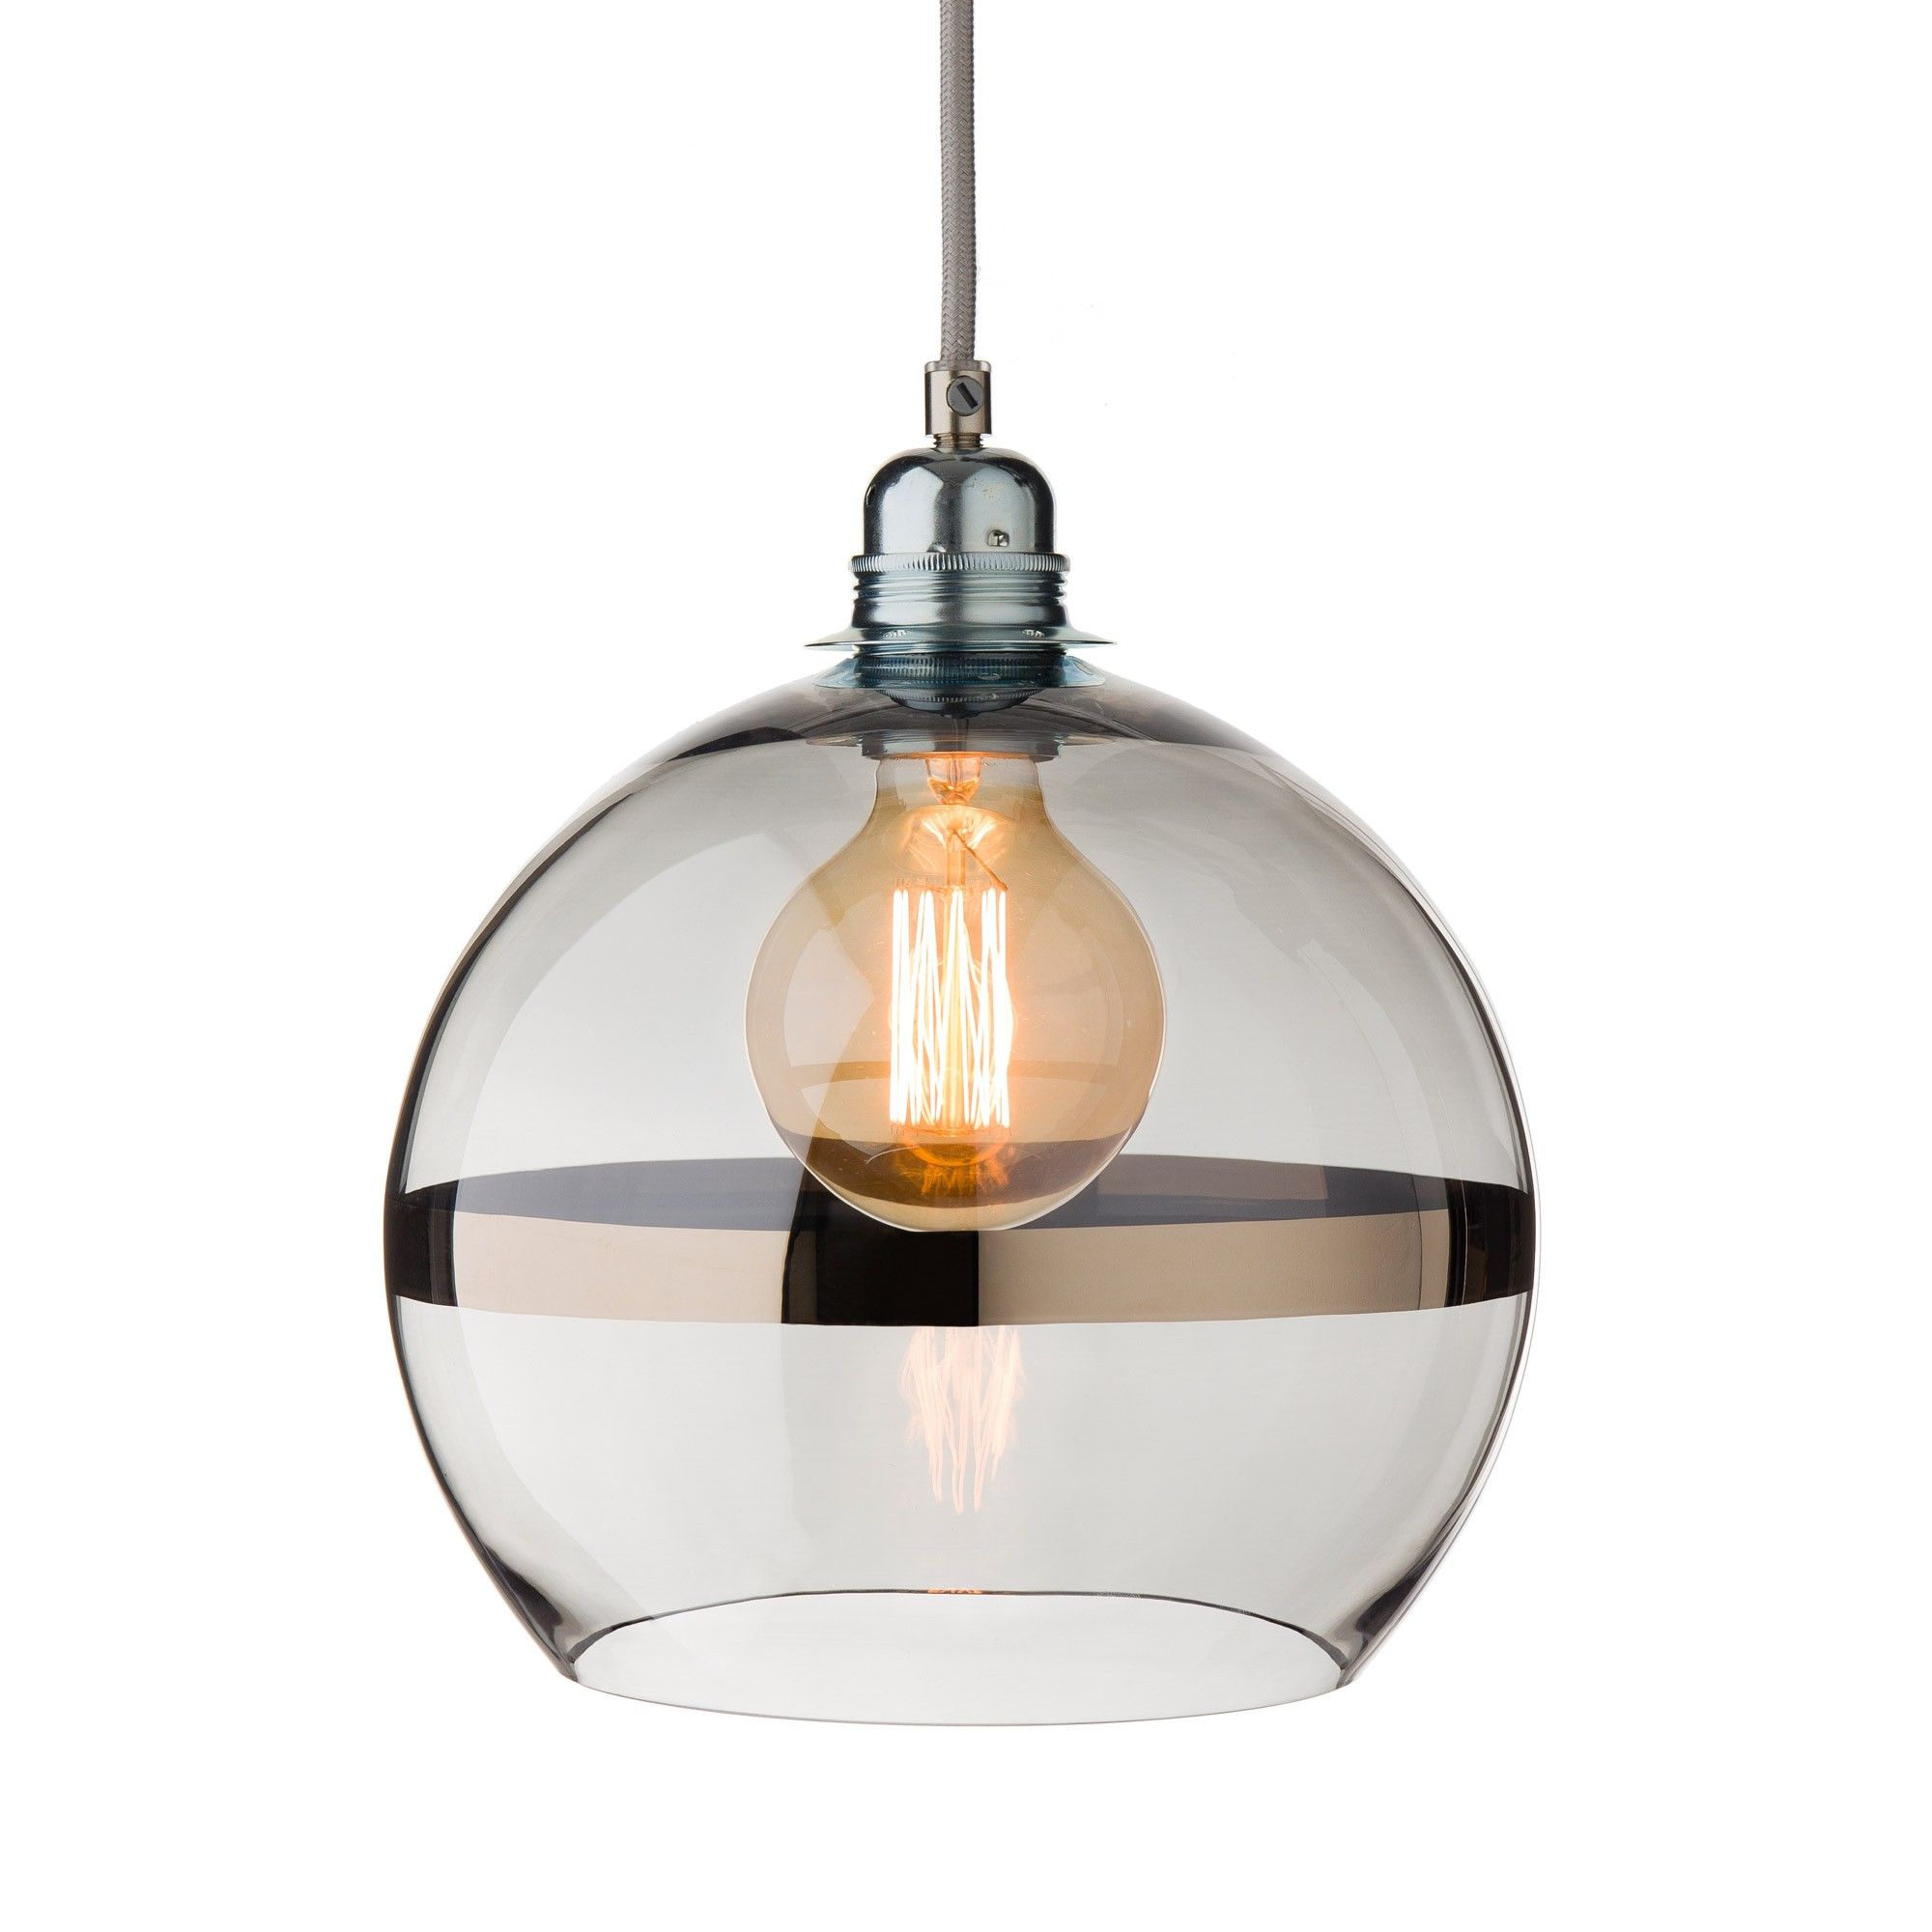 Hängelampe Giveij   Lampen, Anhänger lampen, Lampen online ...